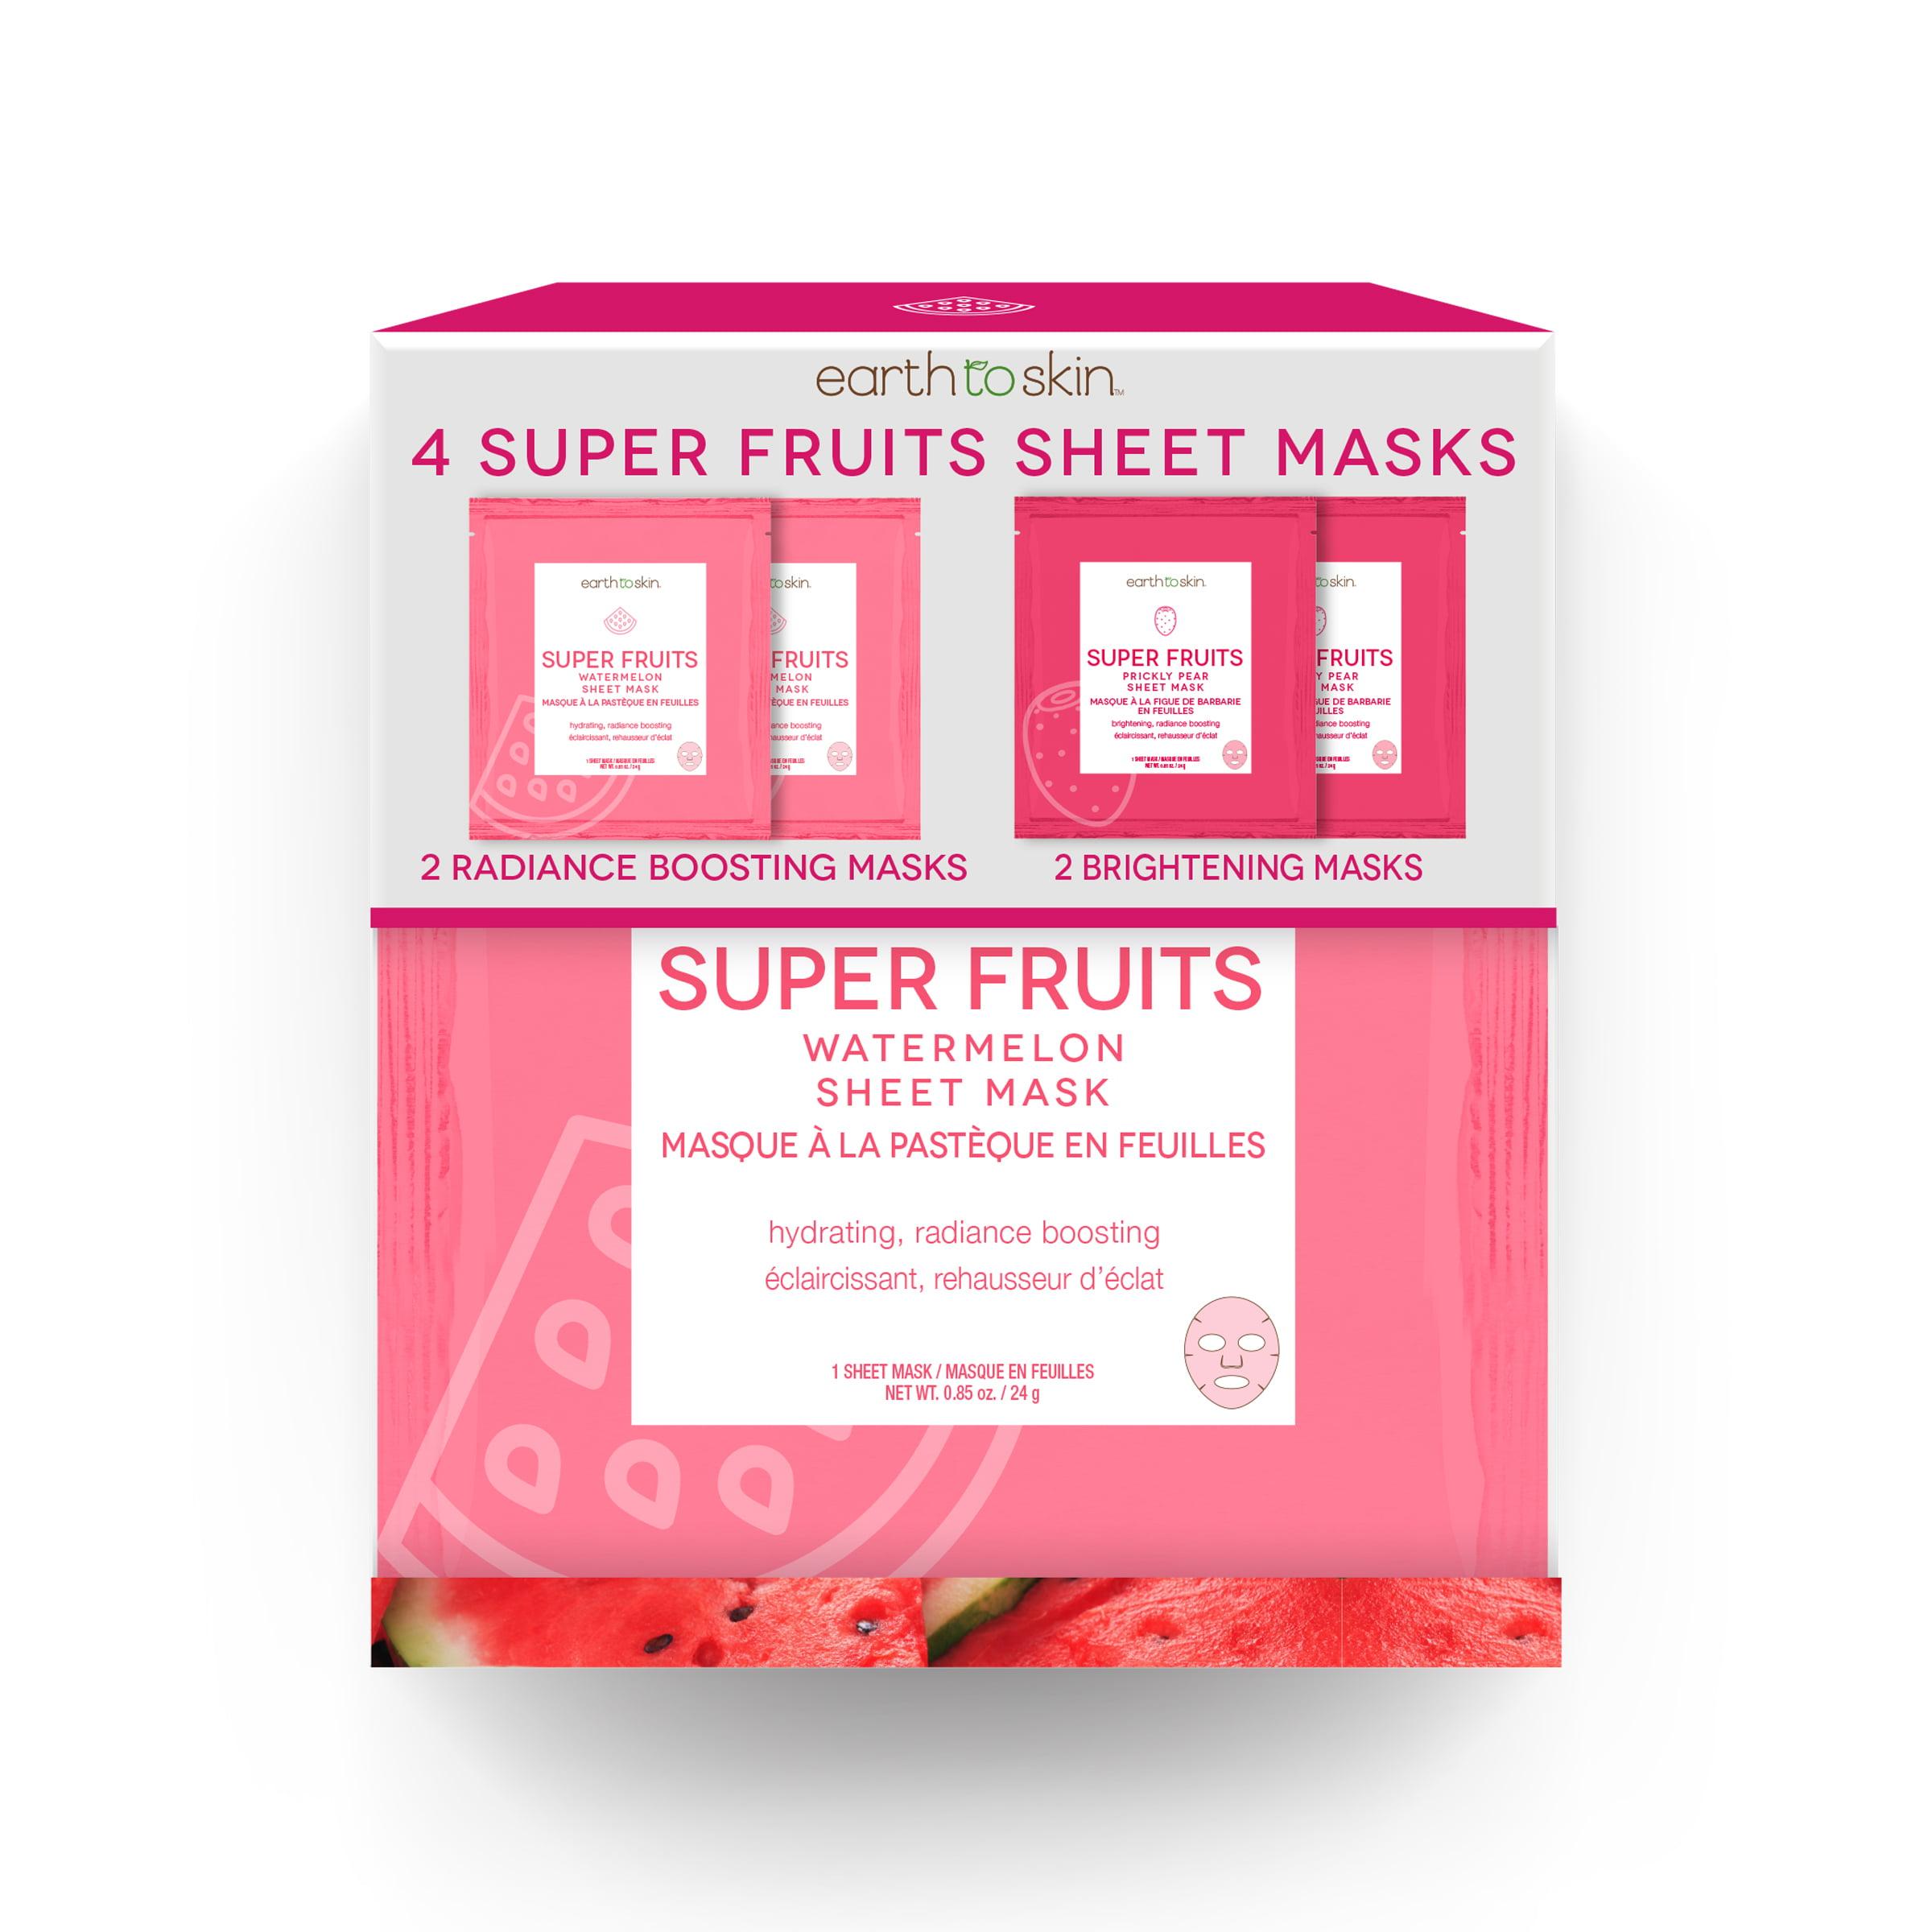 Earth To Skin Super Fruits Watermelon Sheet Masks 4 Pack Walmartcom